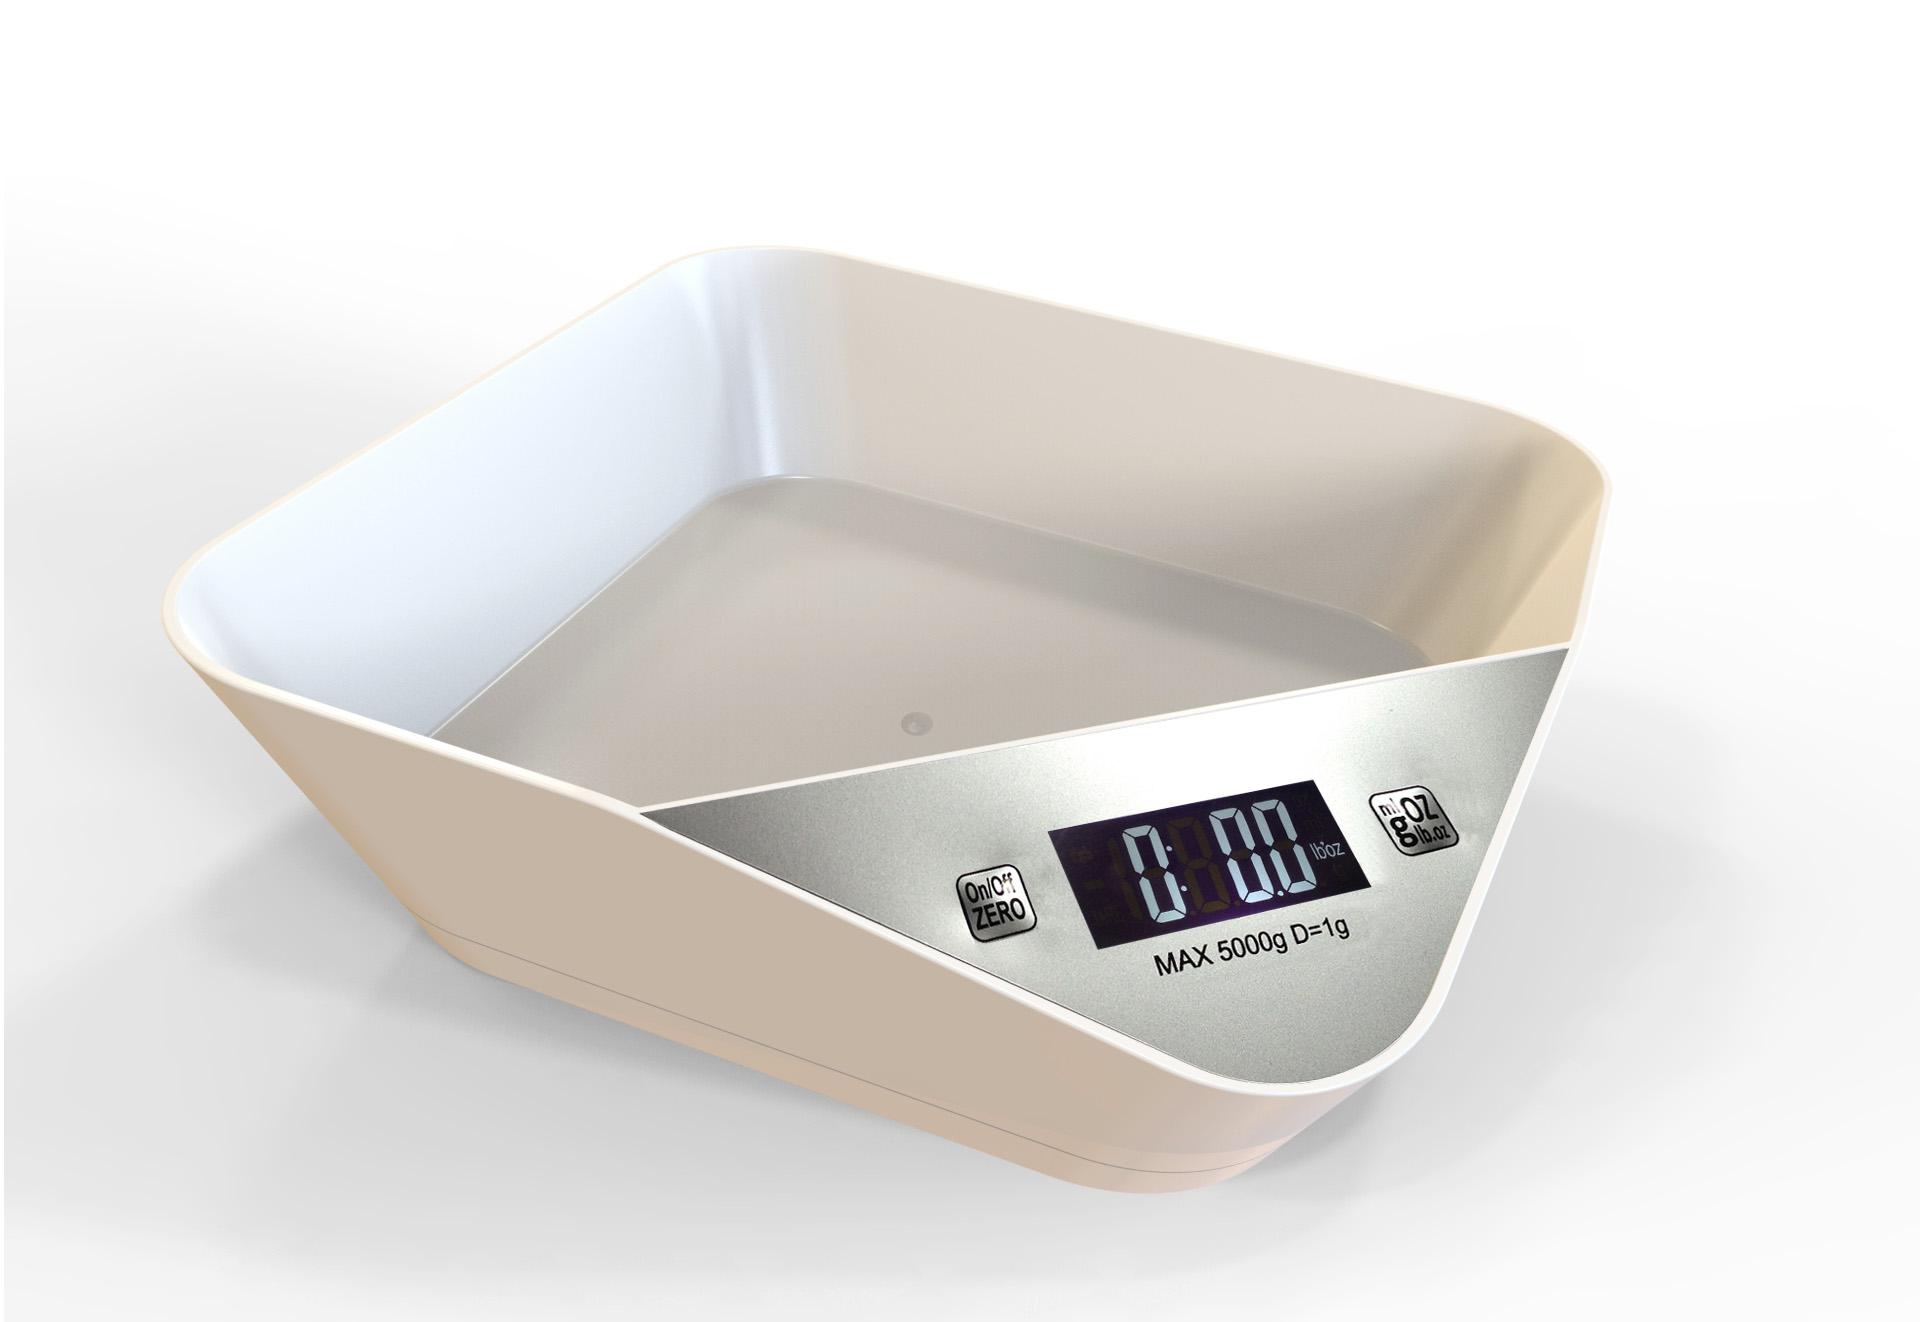 File:White LE-K10 tray kitchen scale.jpg - Wikimedia Commons